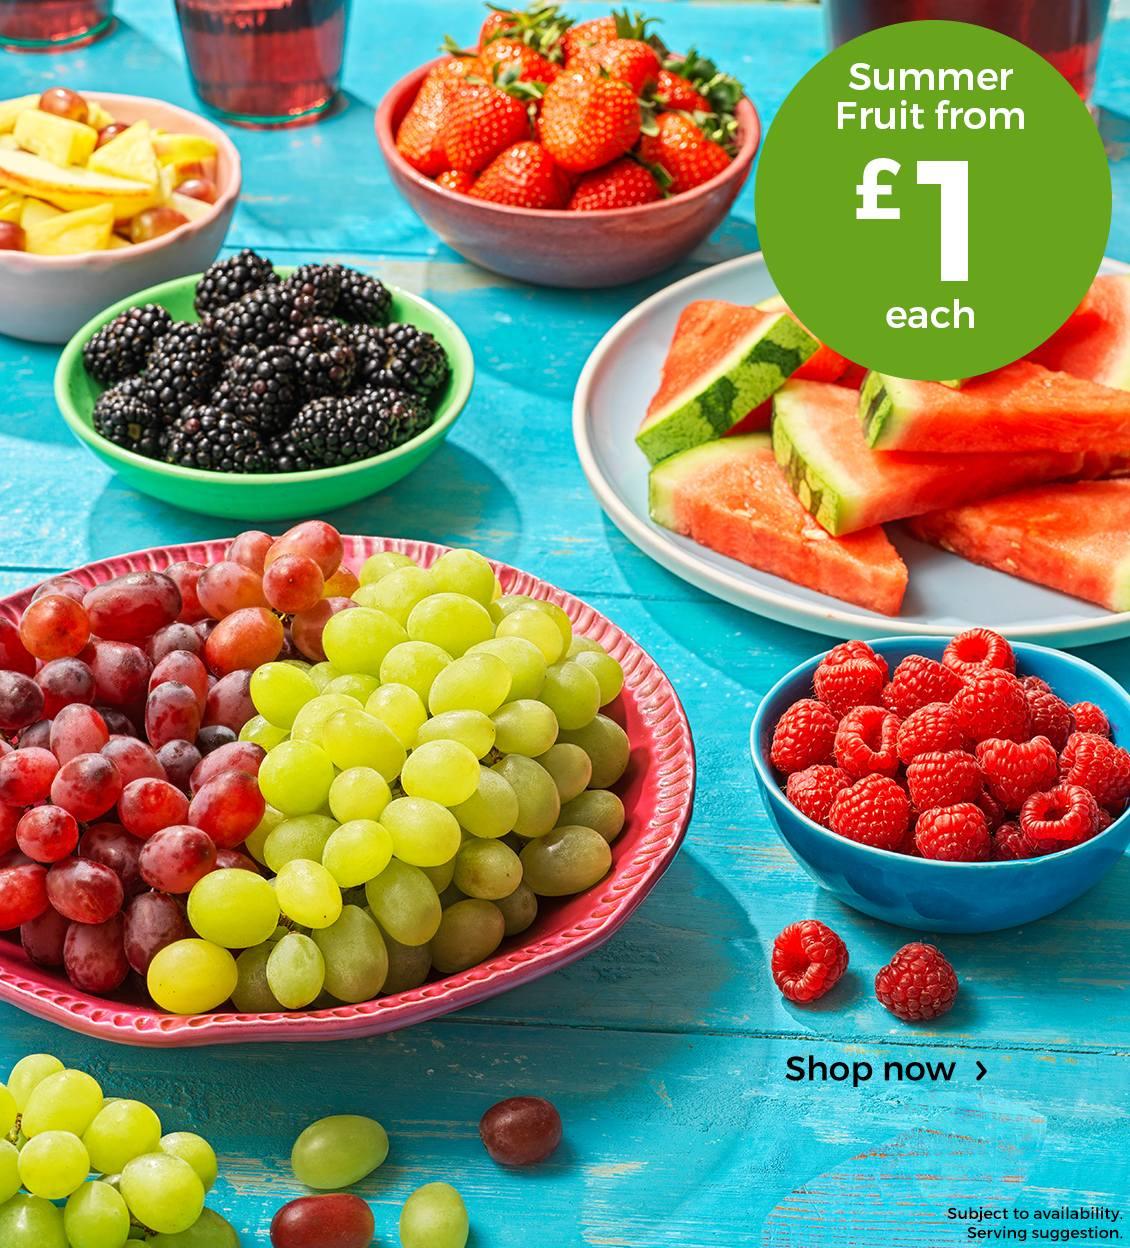 Asda com - Online Food Shopping, George, & more